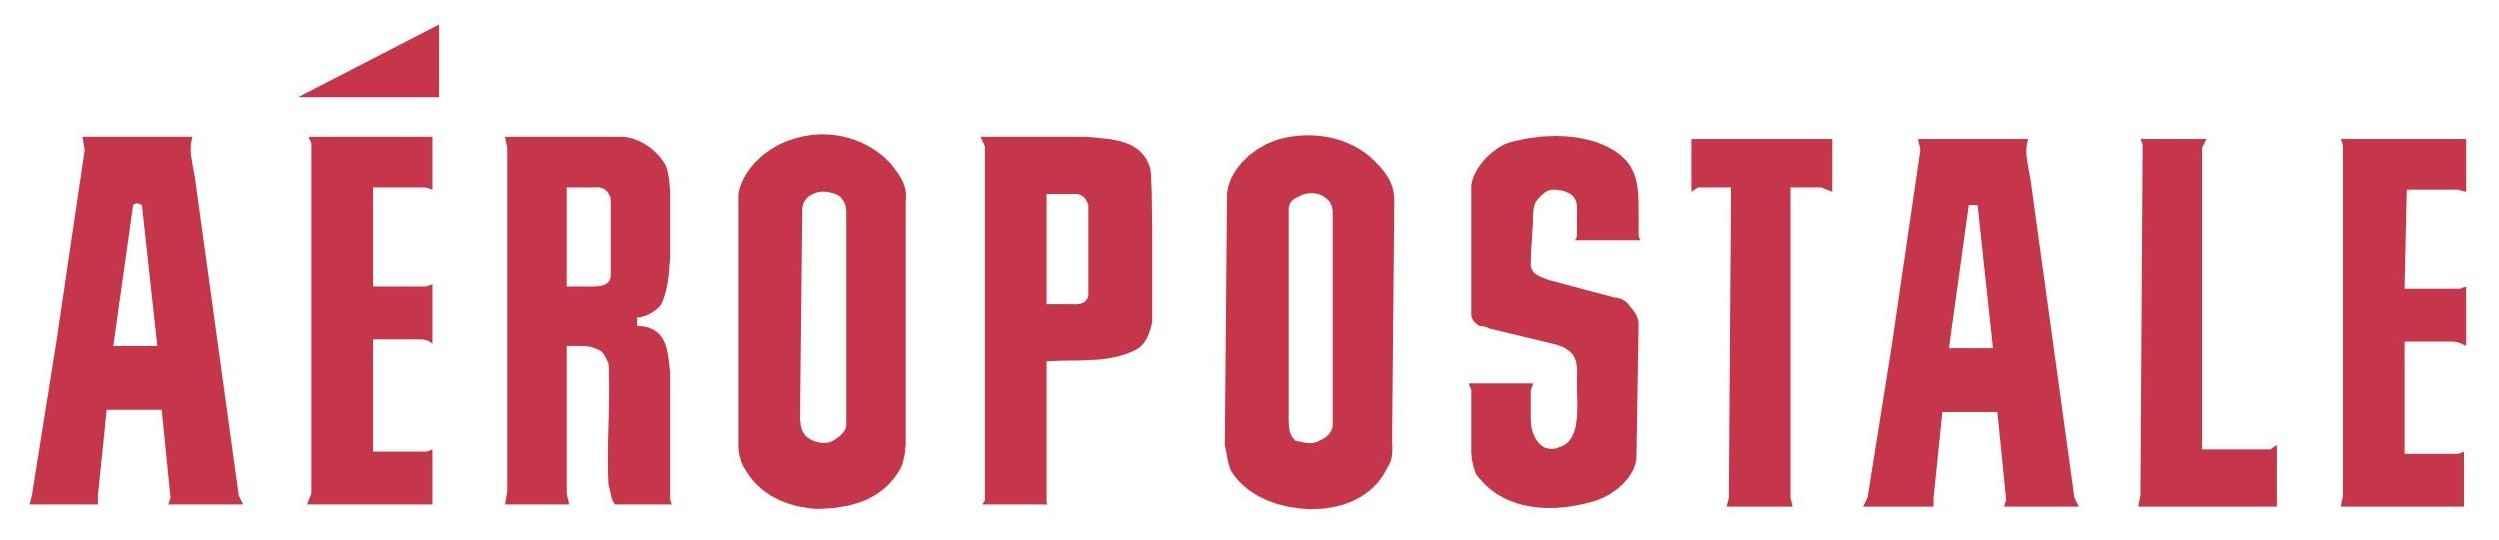 Aéropostale Logo Download Vector.